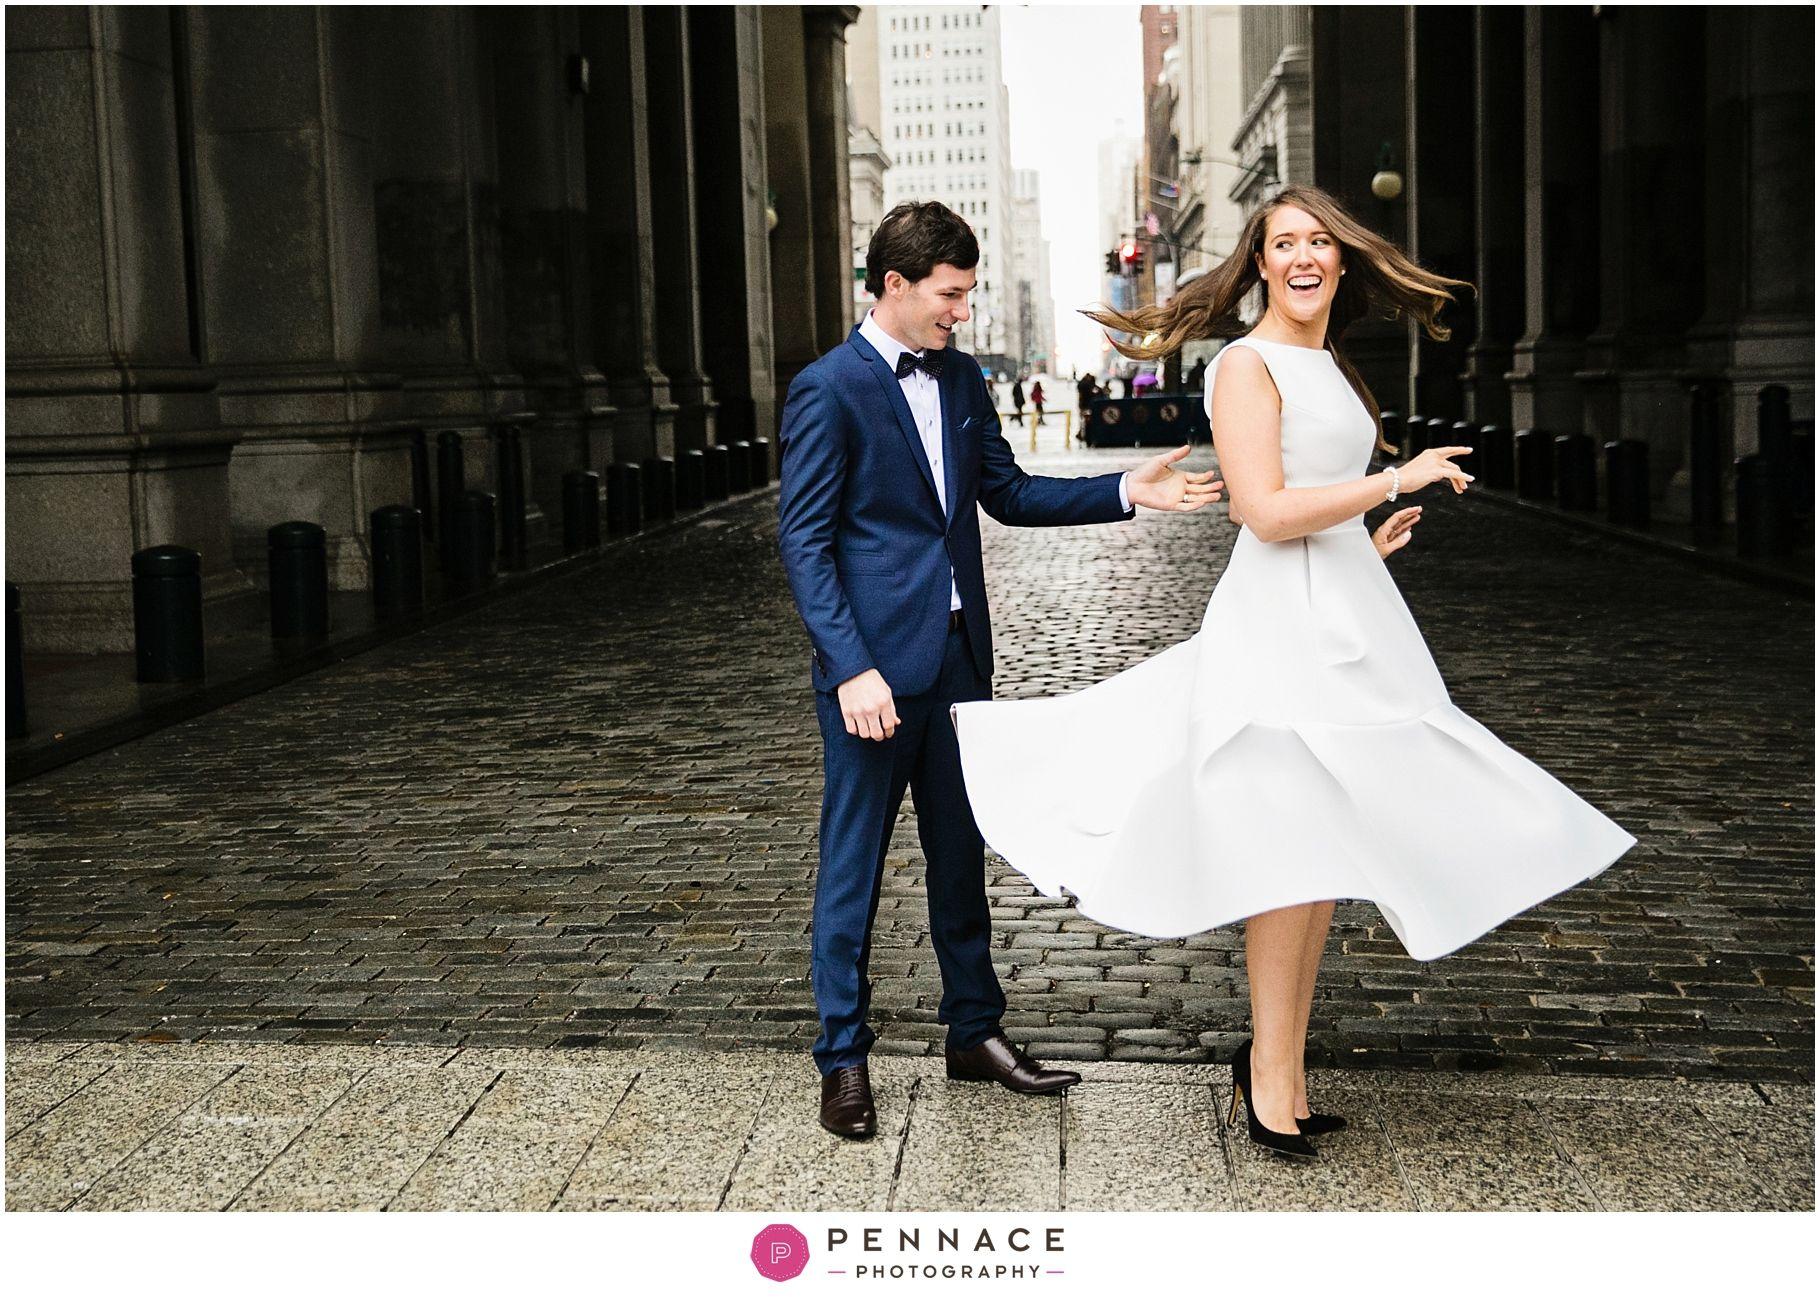 Wedding dress twirl general wedding inspiration pinterest city